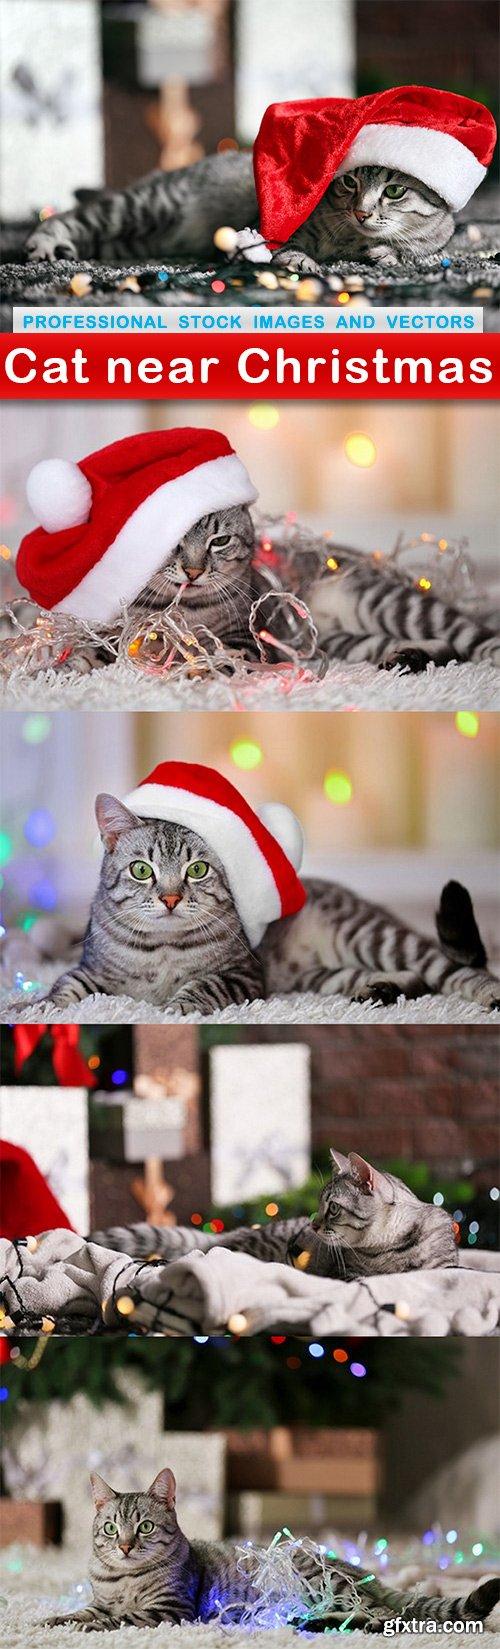 Cat near Christmas - 5 UHQ JPEG